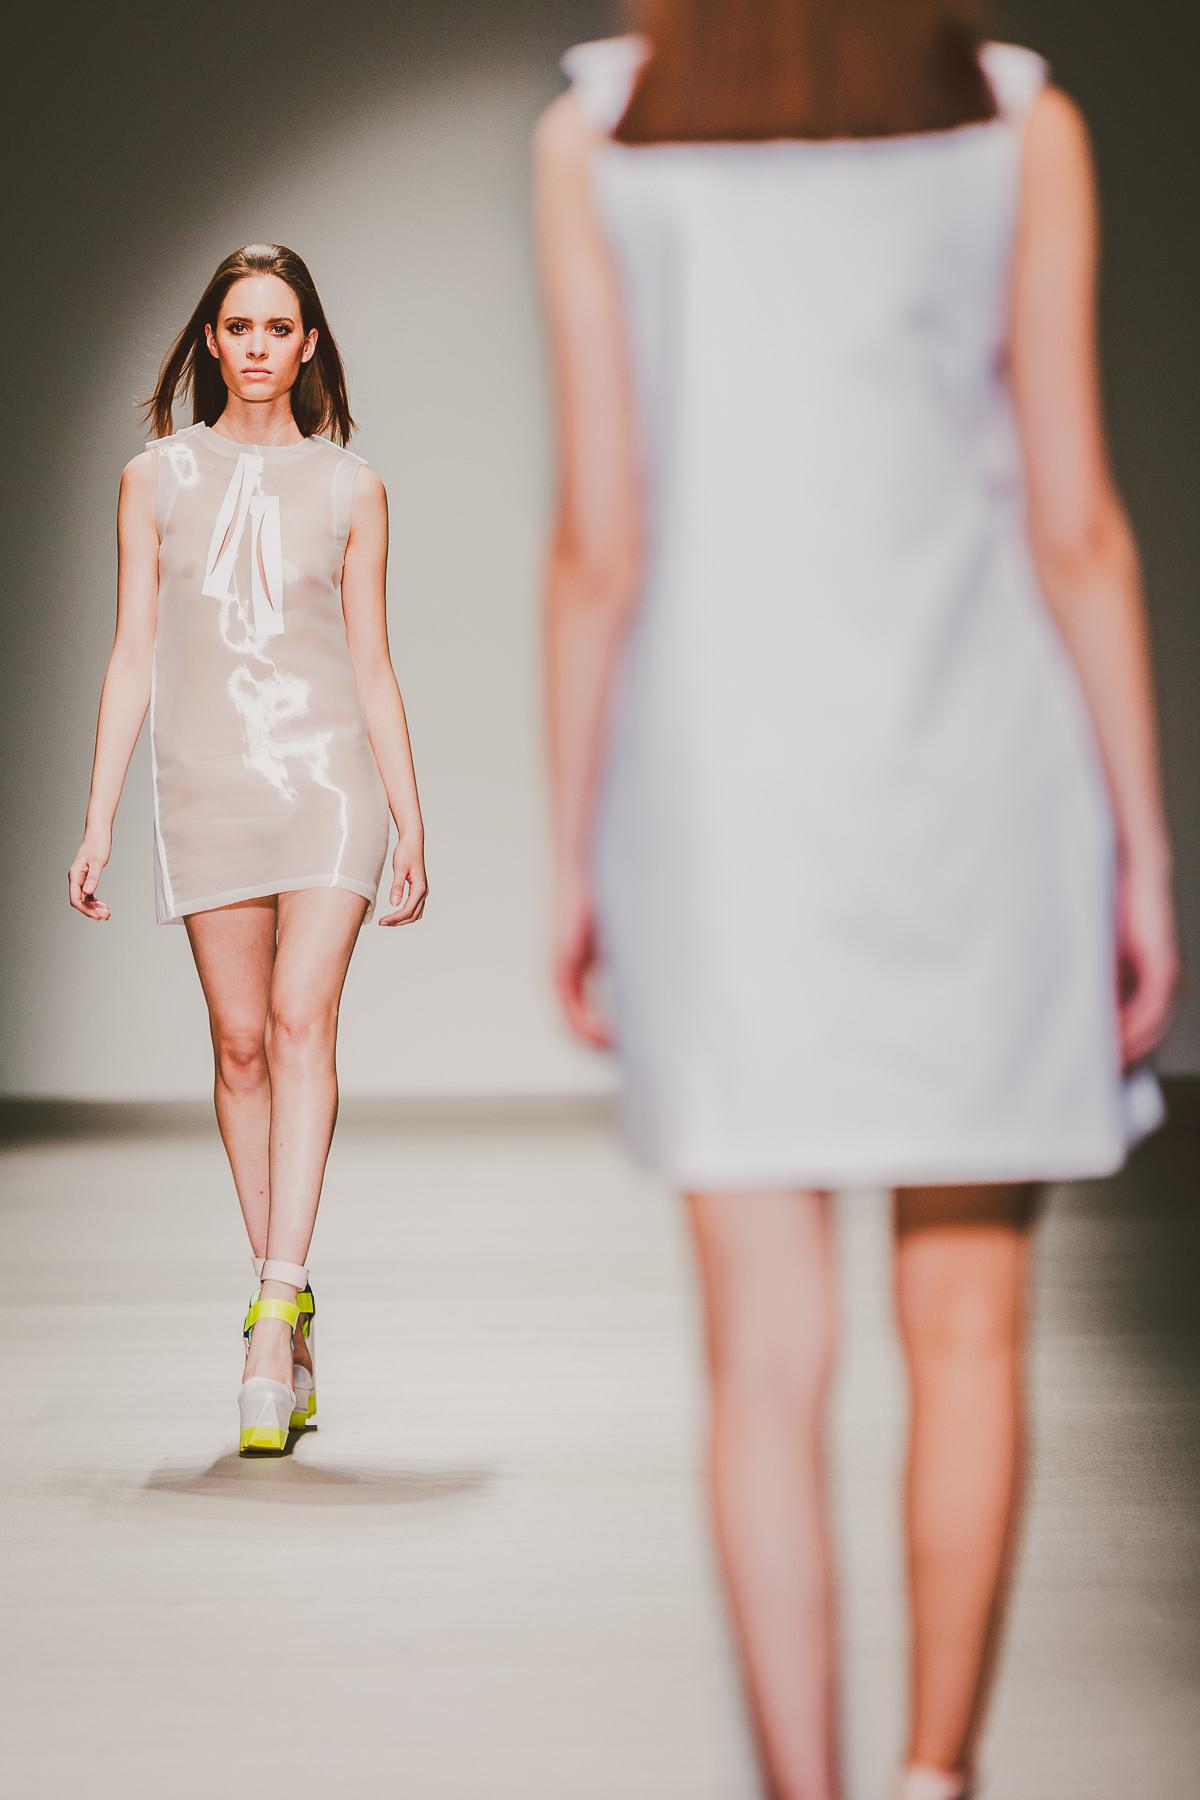 012 - London Fashion Week